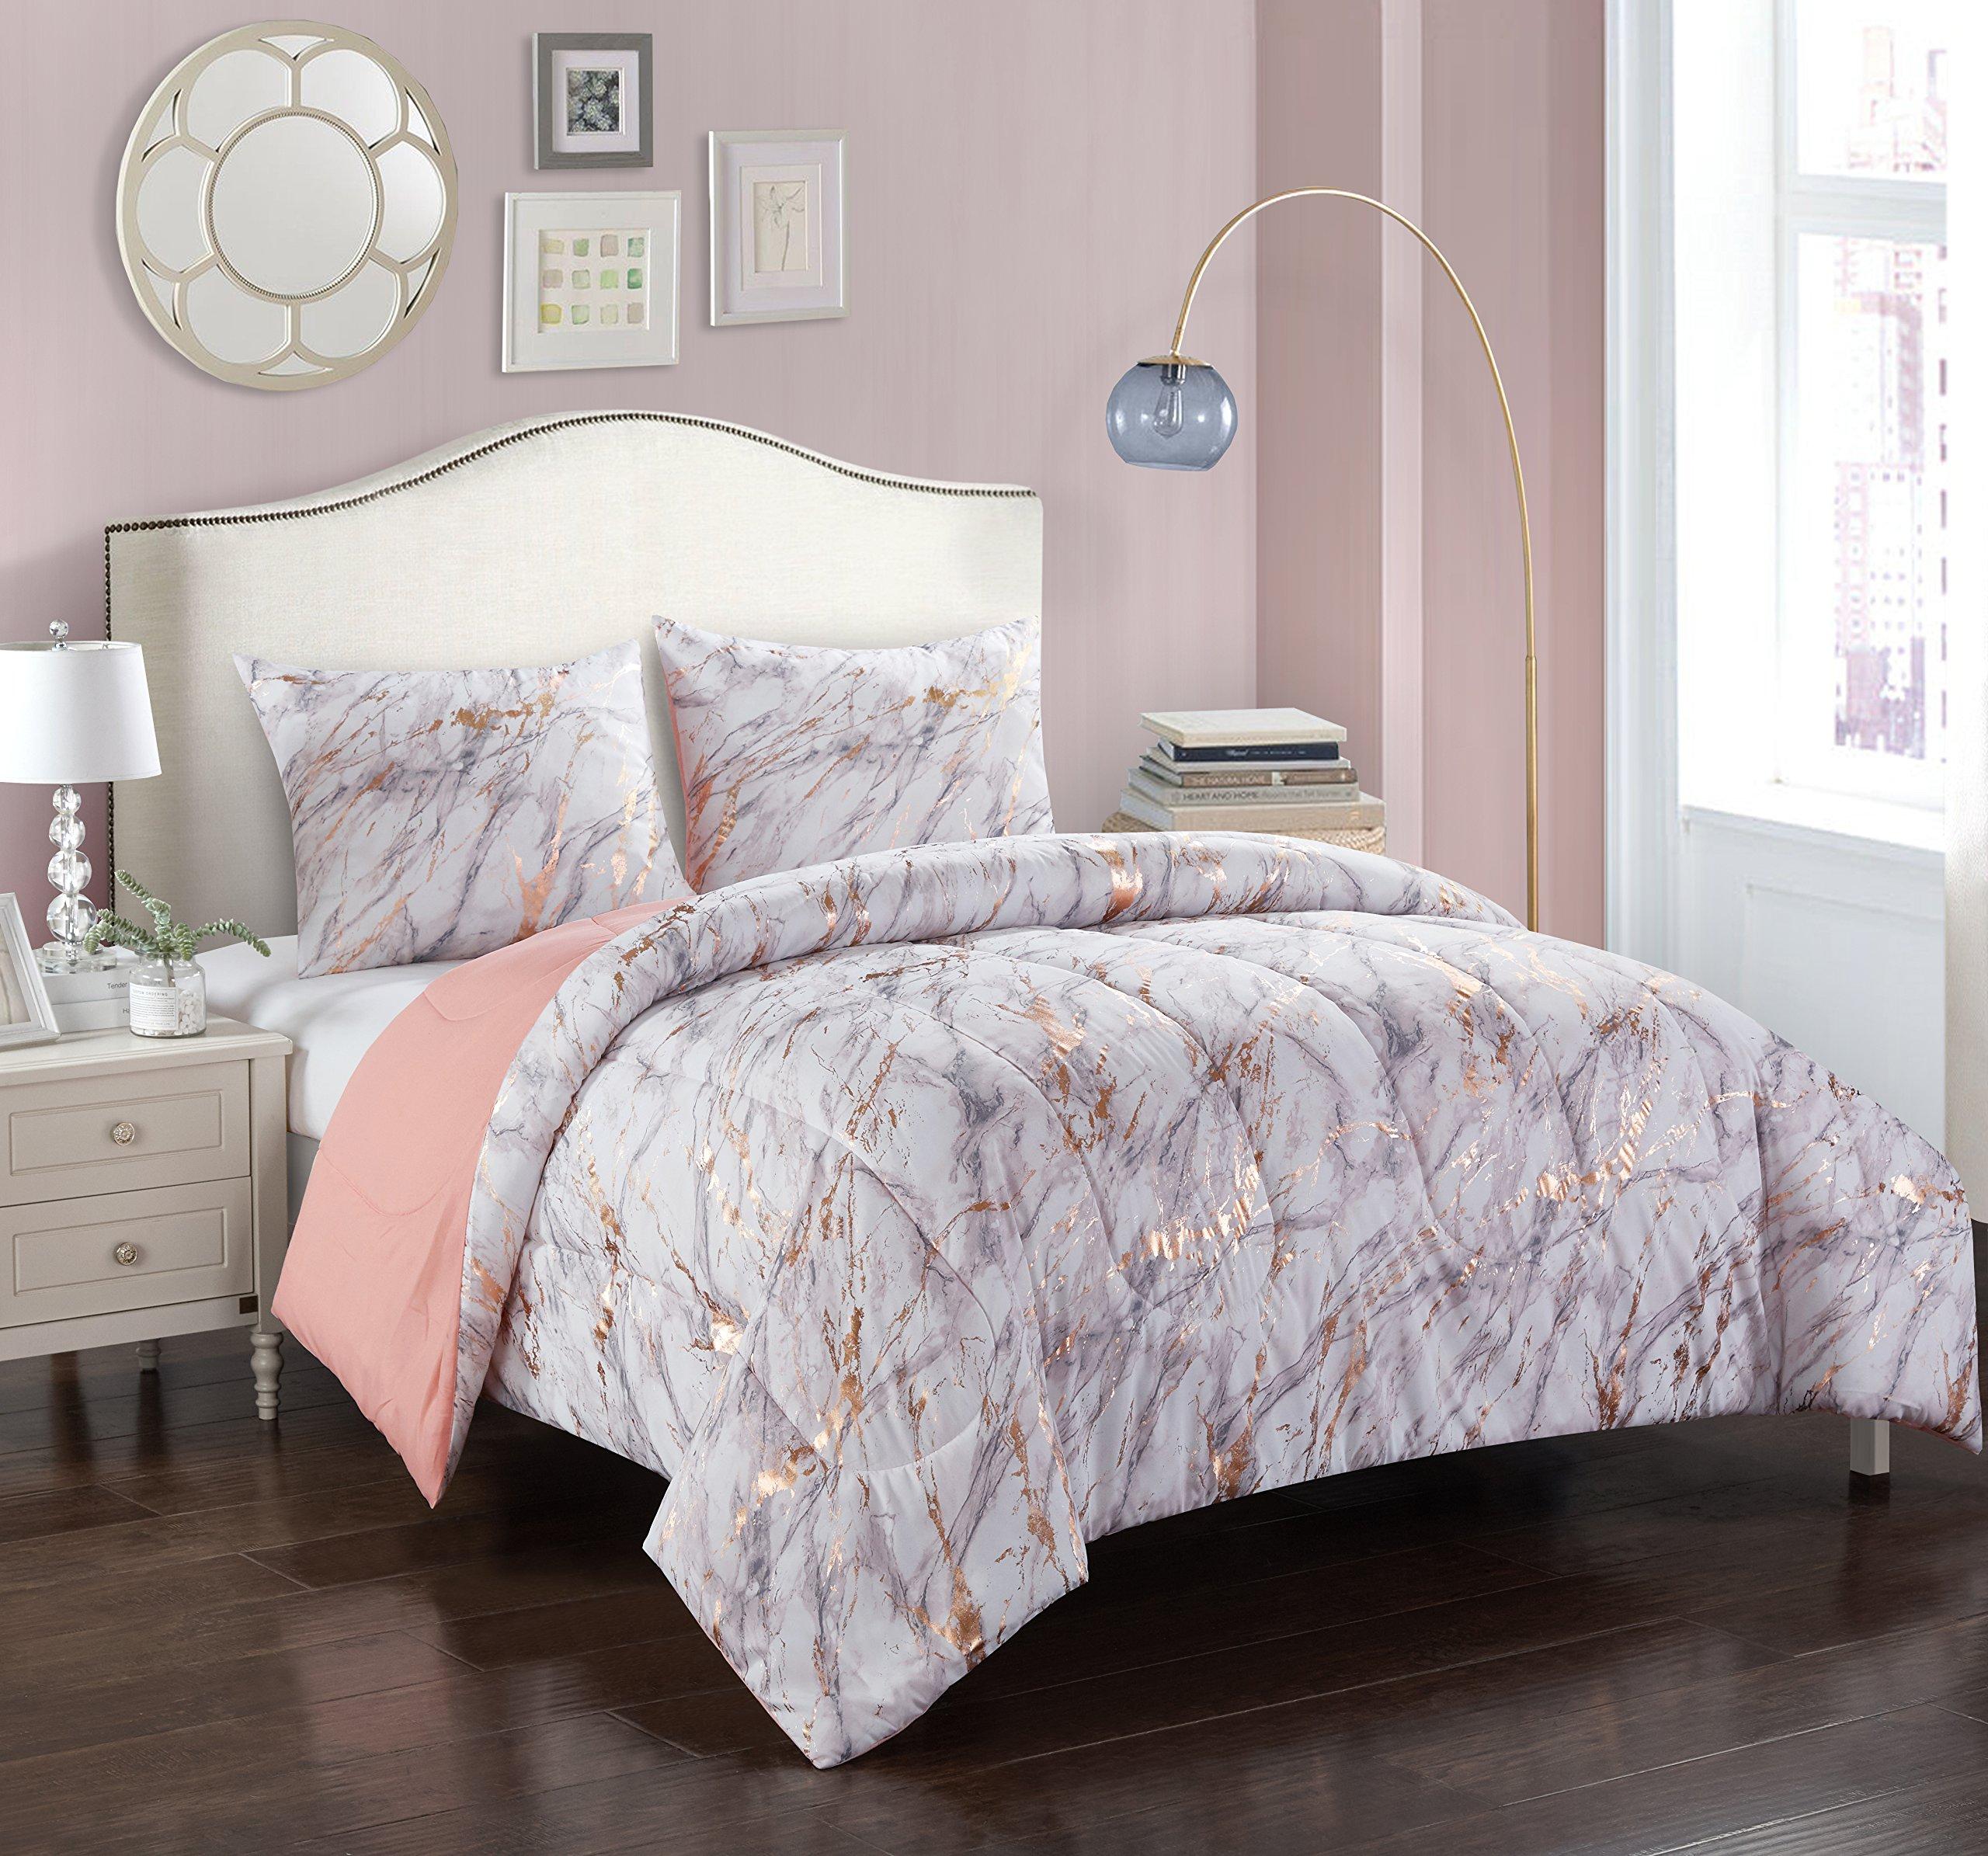 Cute Rose Gold Pop Shop Marble Comforter Set Cute Decor